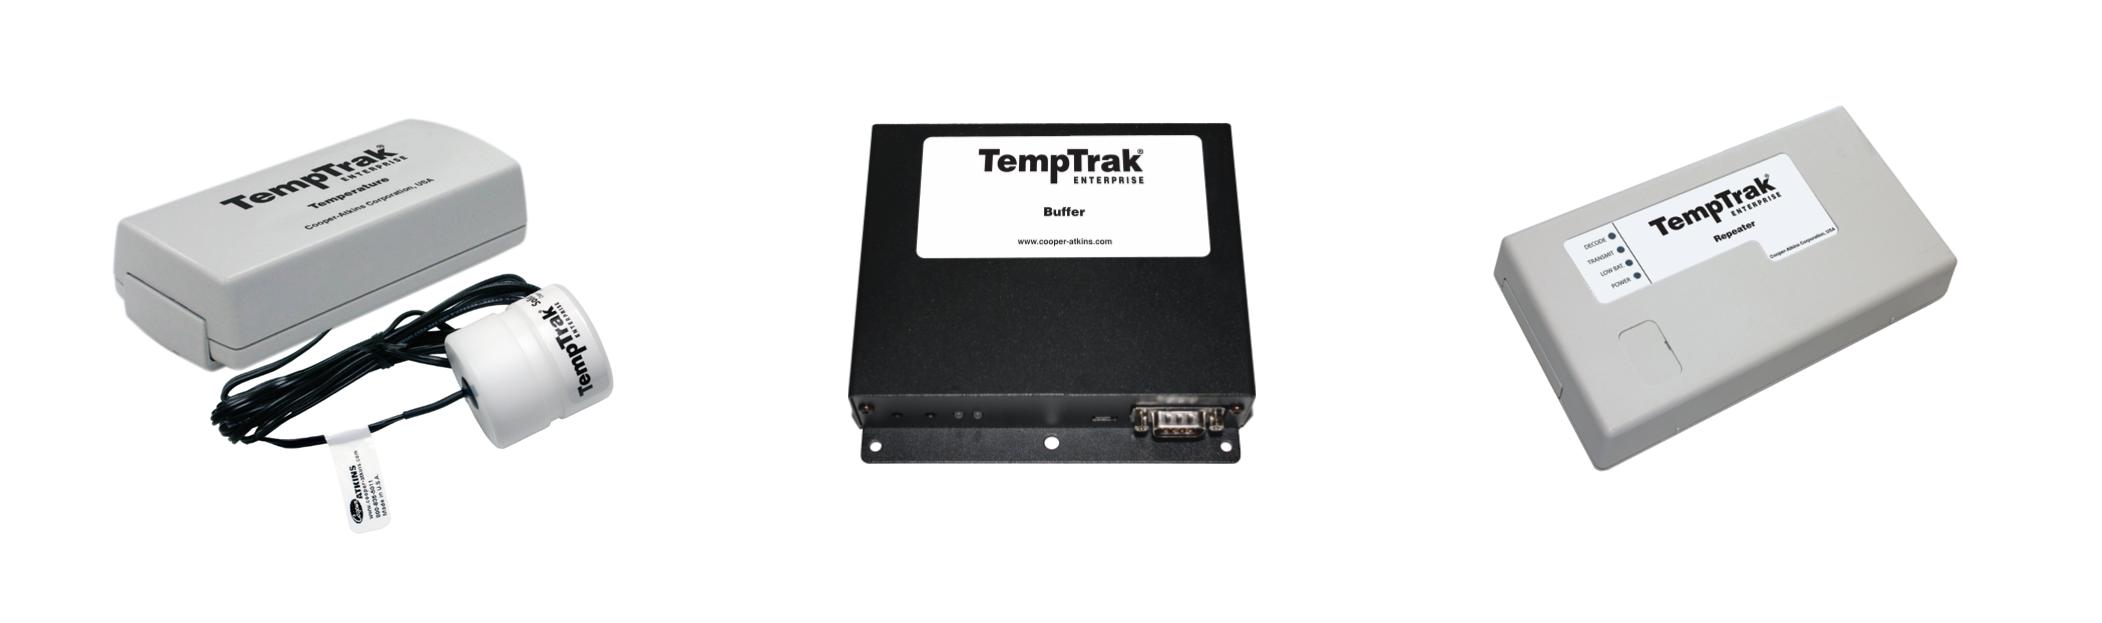 TempTrak Central Monitoring System hardware